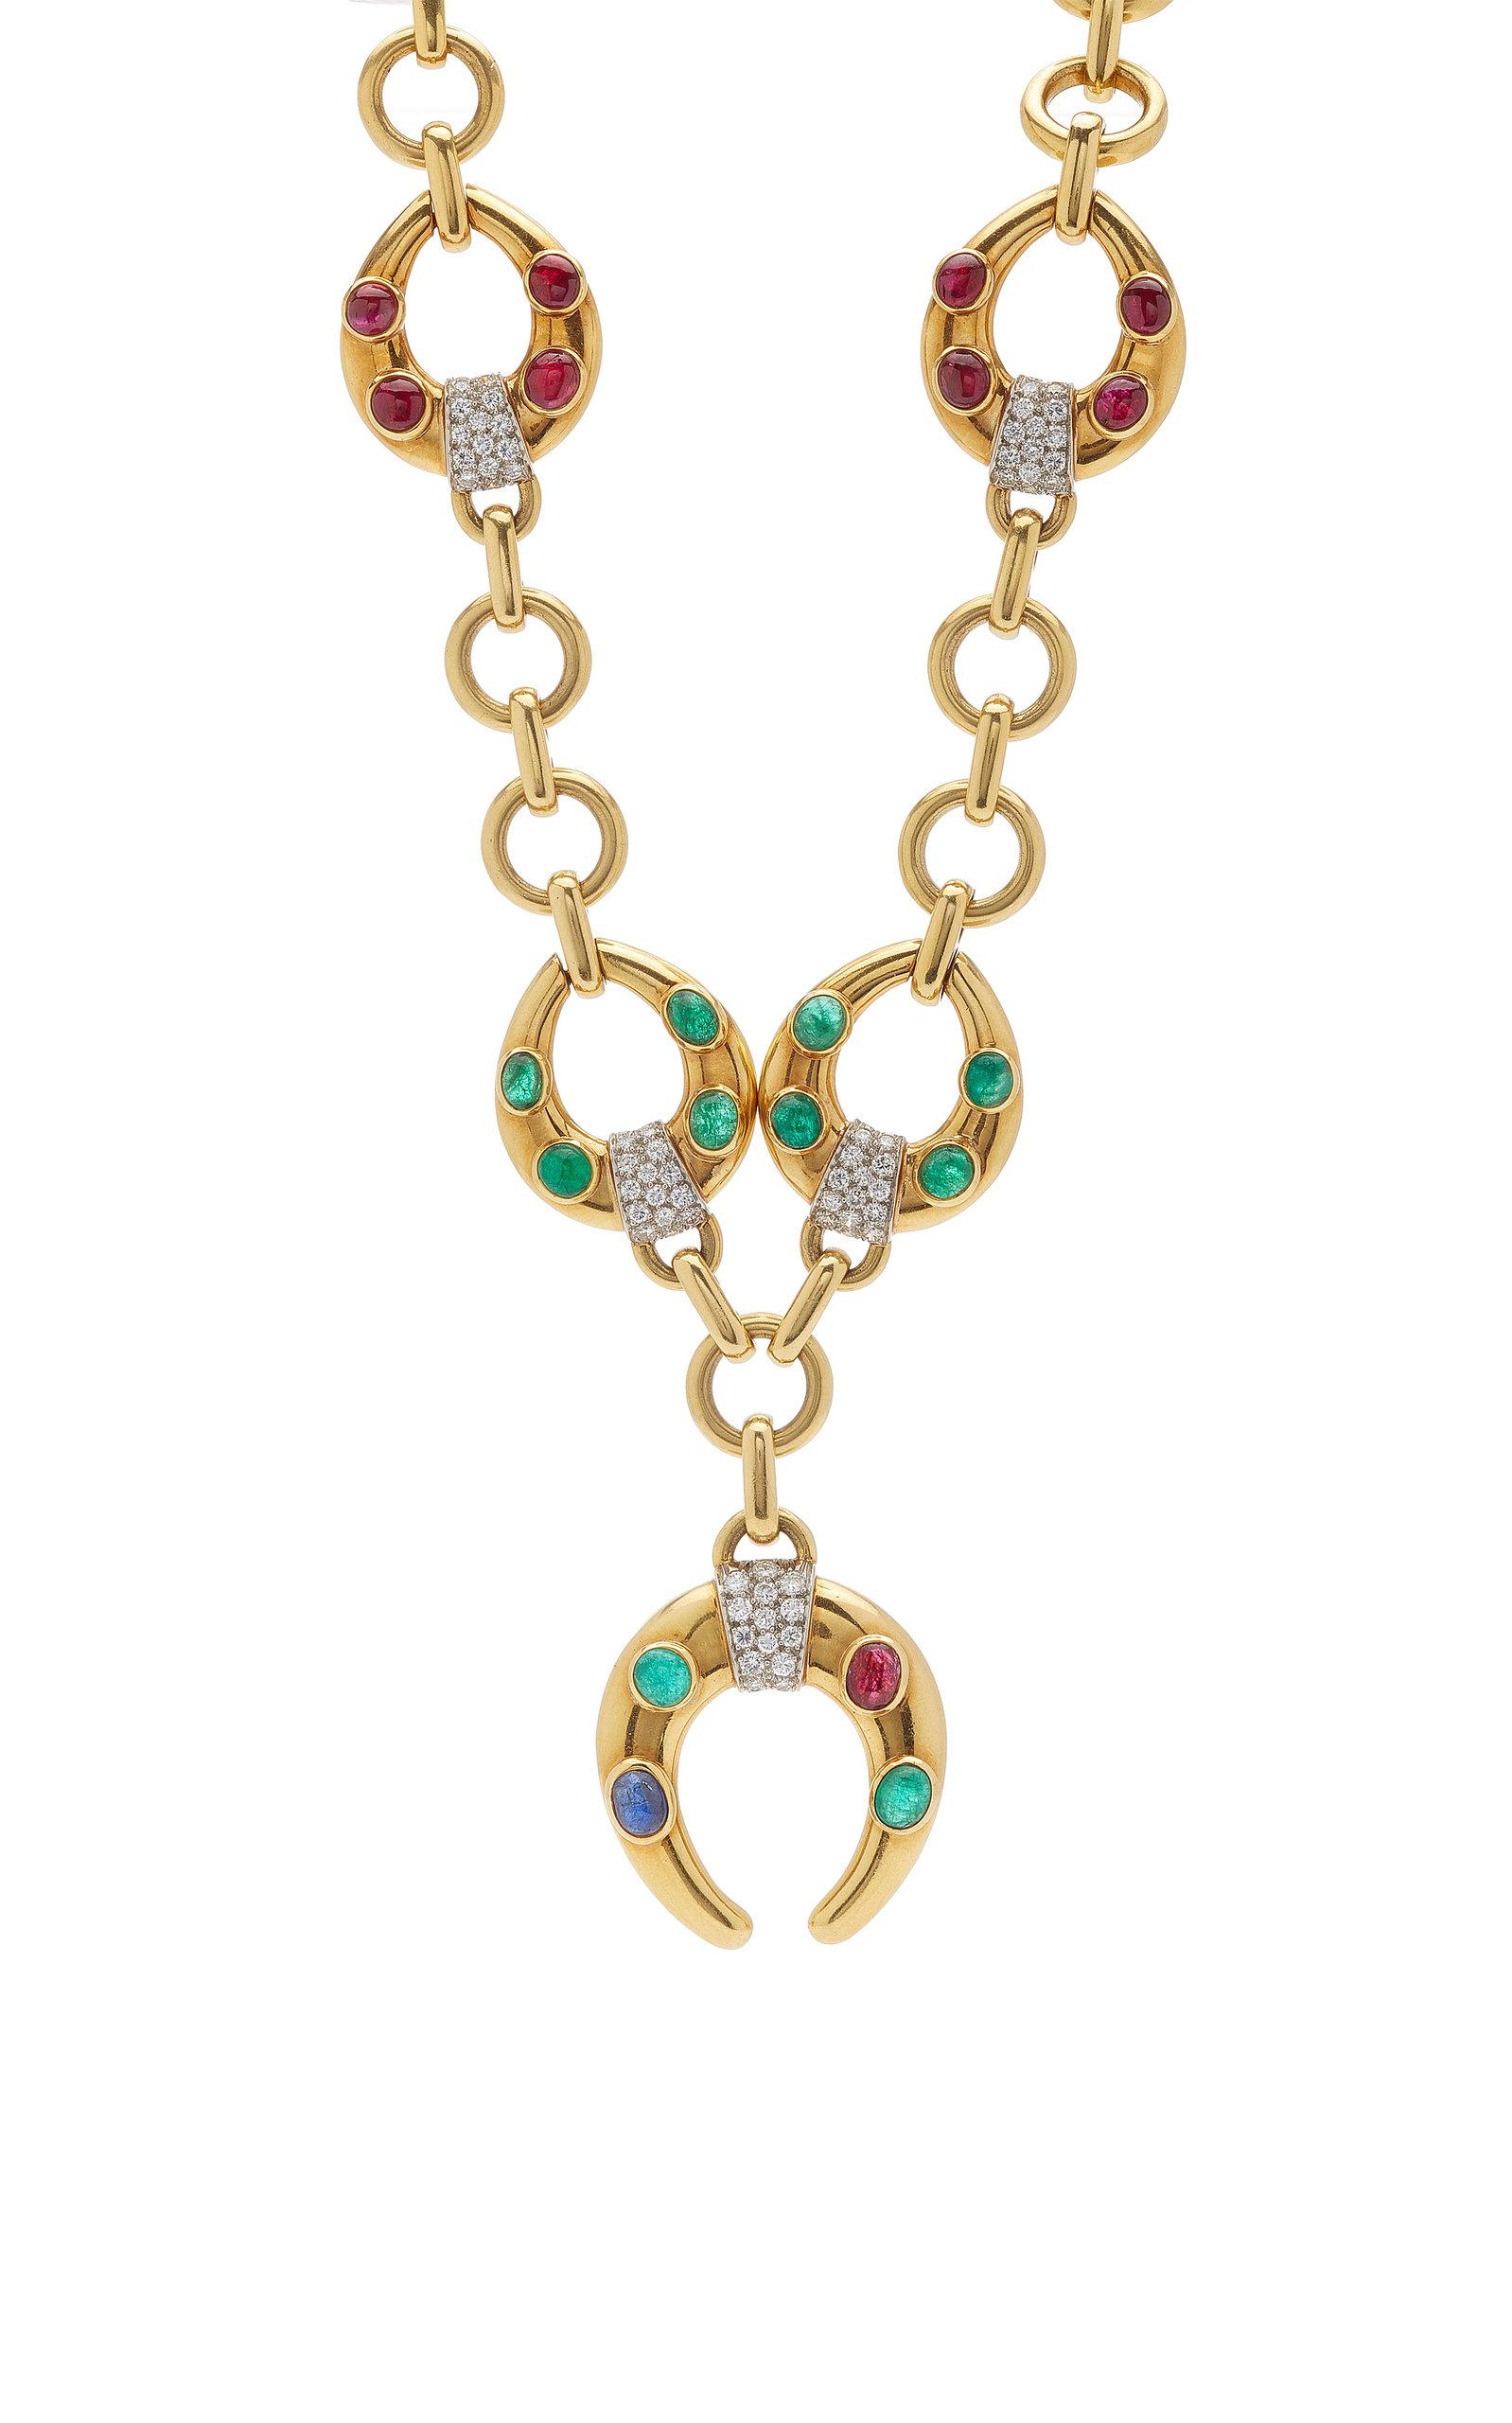 RUSSIAN CHRISTMAS HORSES Pendant Necklace Vintage Christmas Handmade Art Jewelry